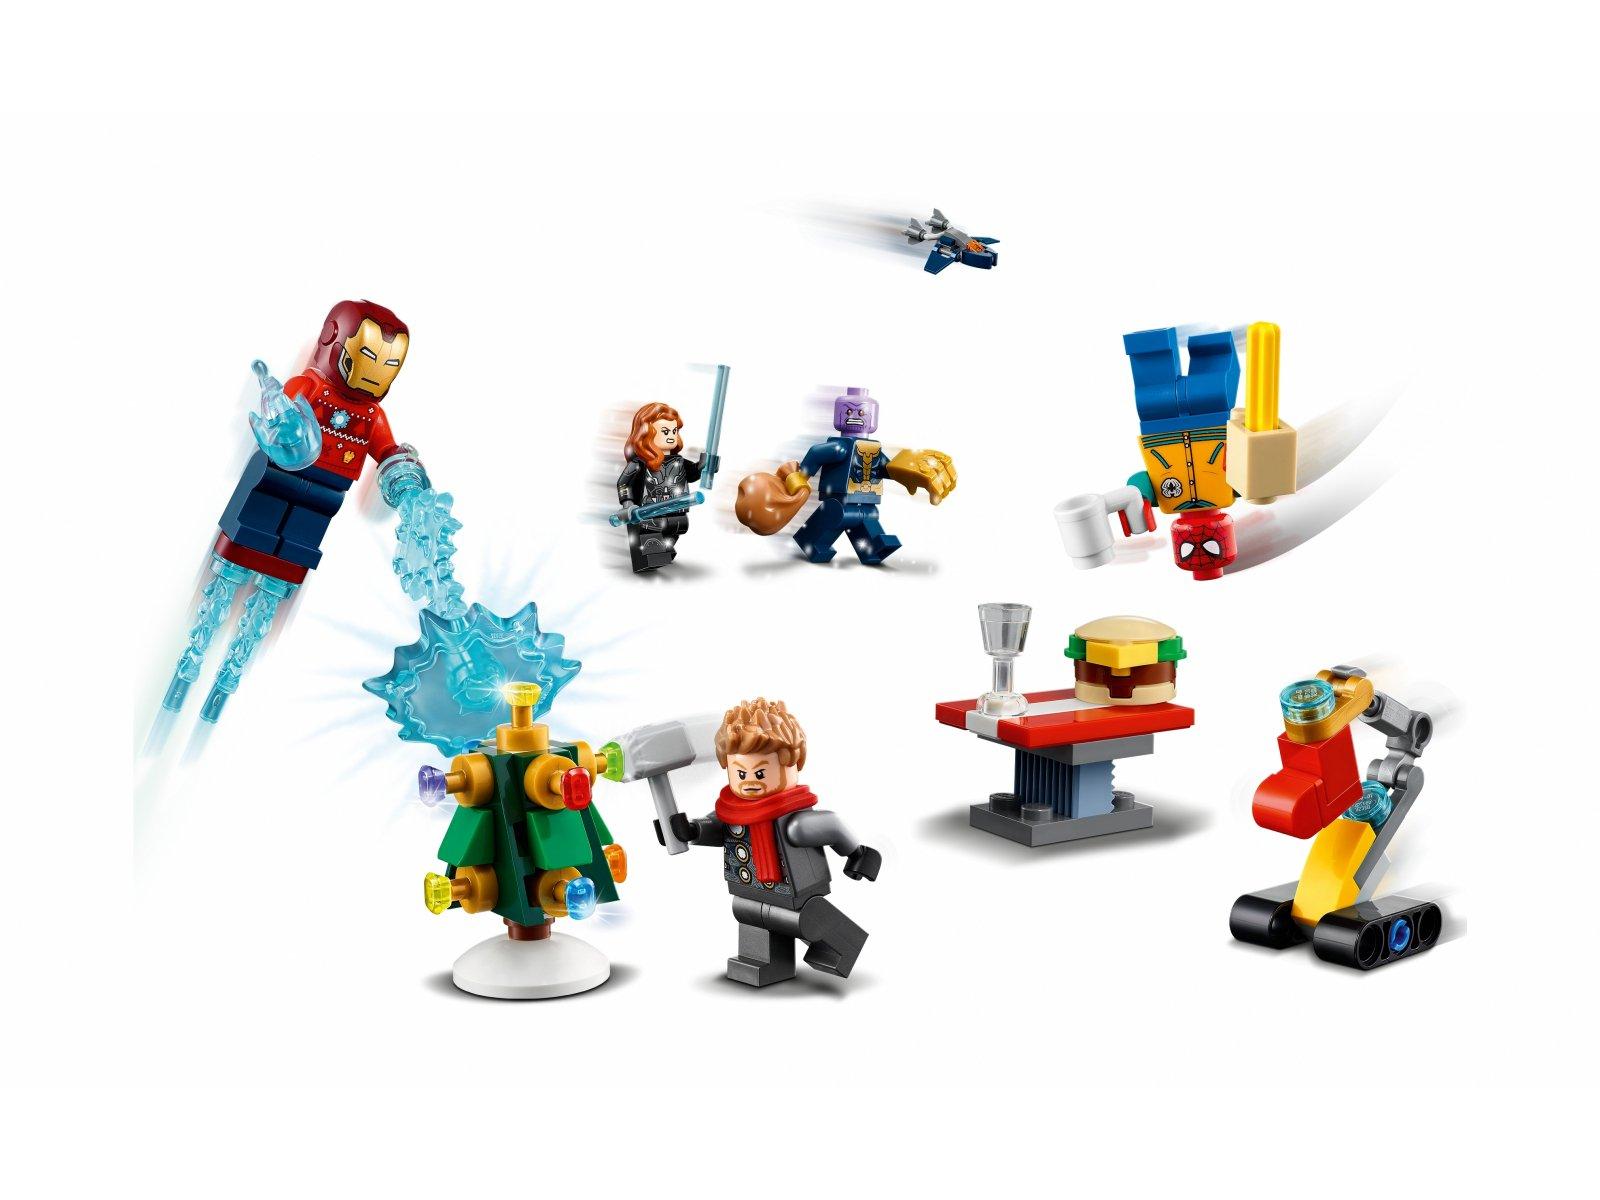 LEGO 76196 Marvel Kalendarz adwentowy Avengers